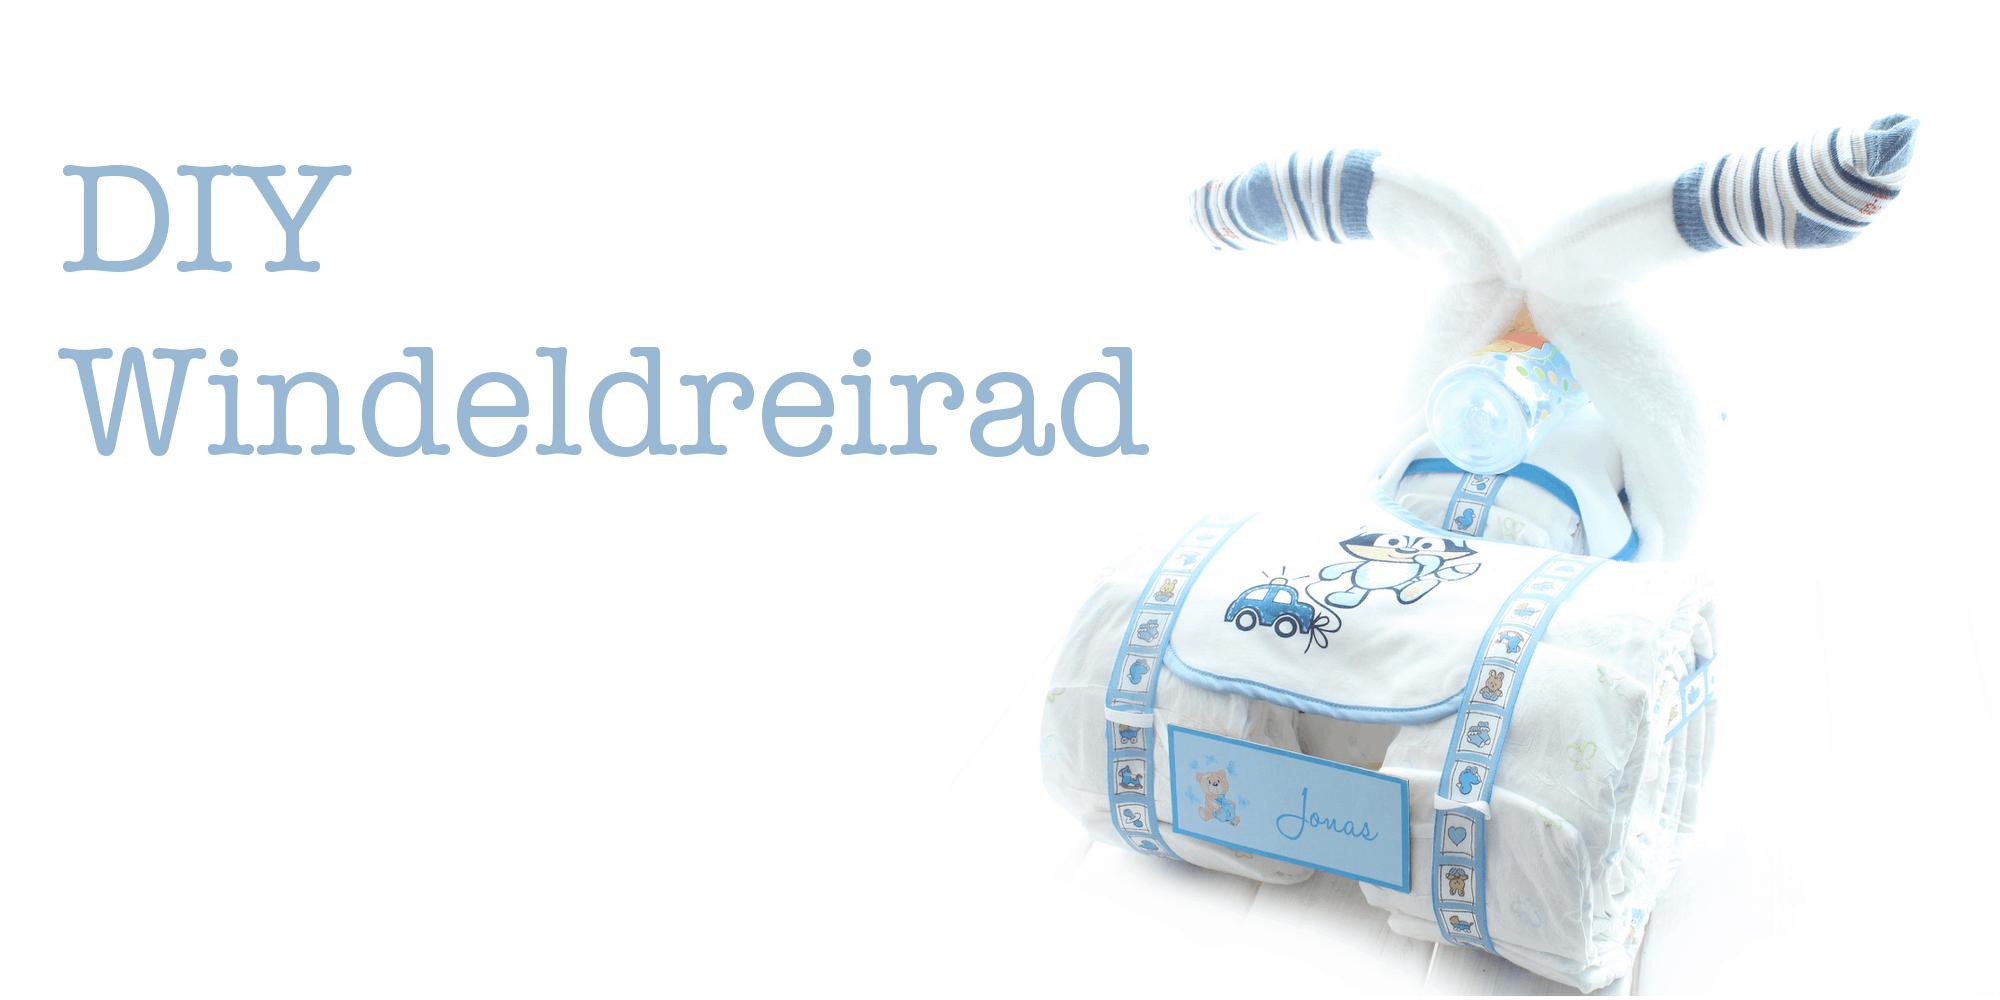 Windeldreirad DIY